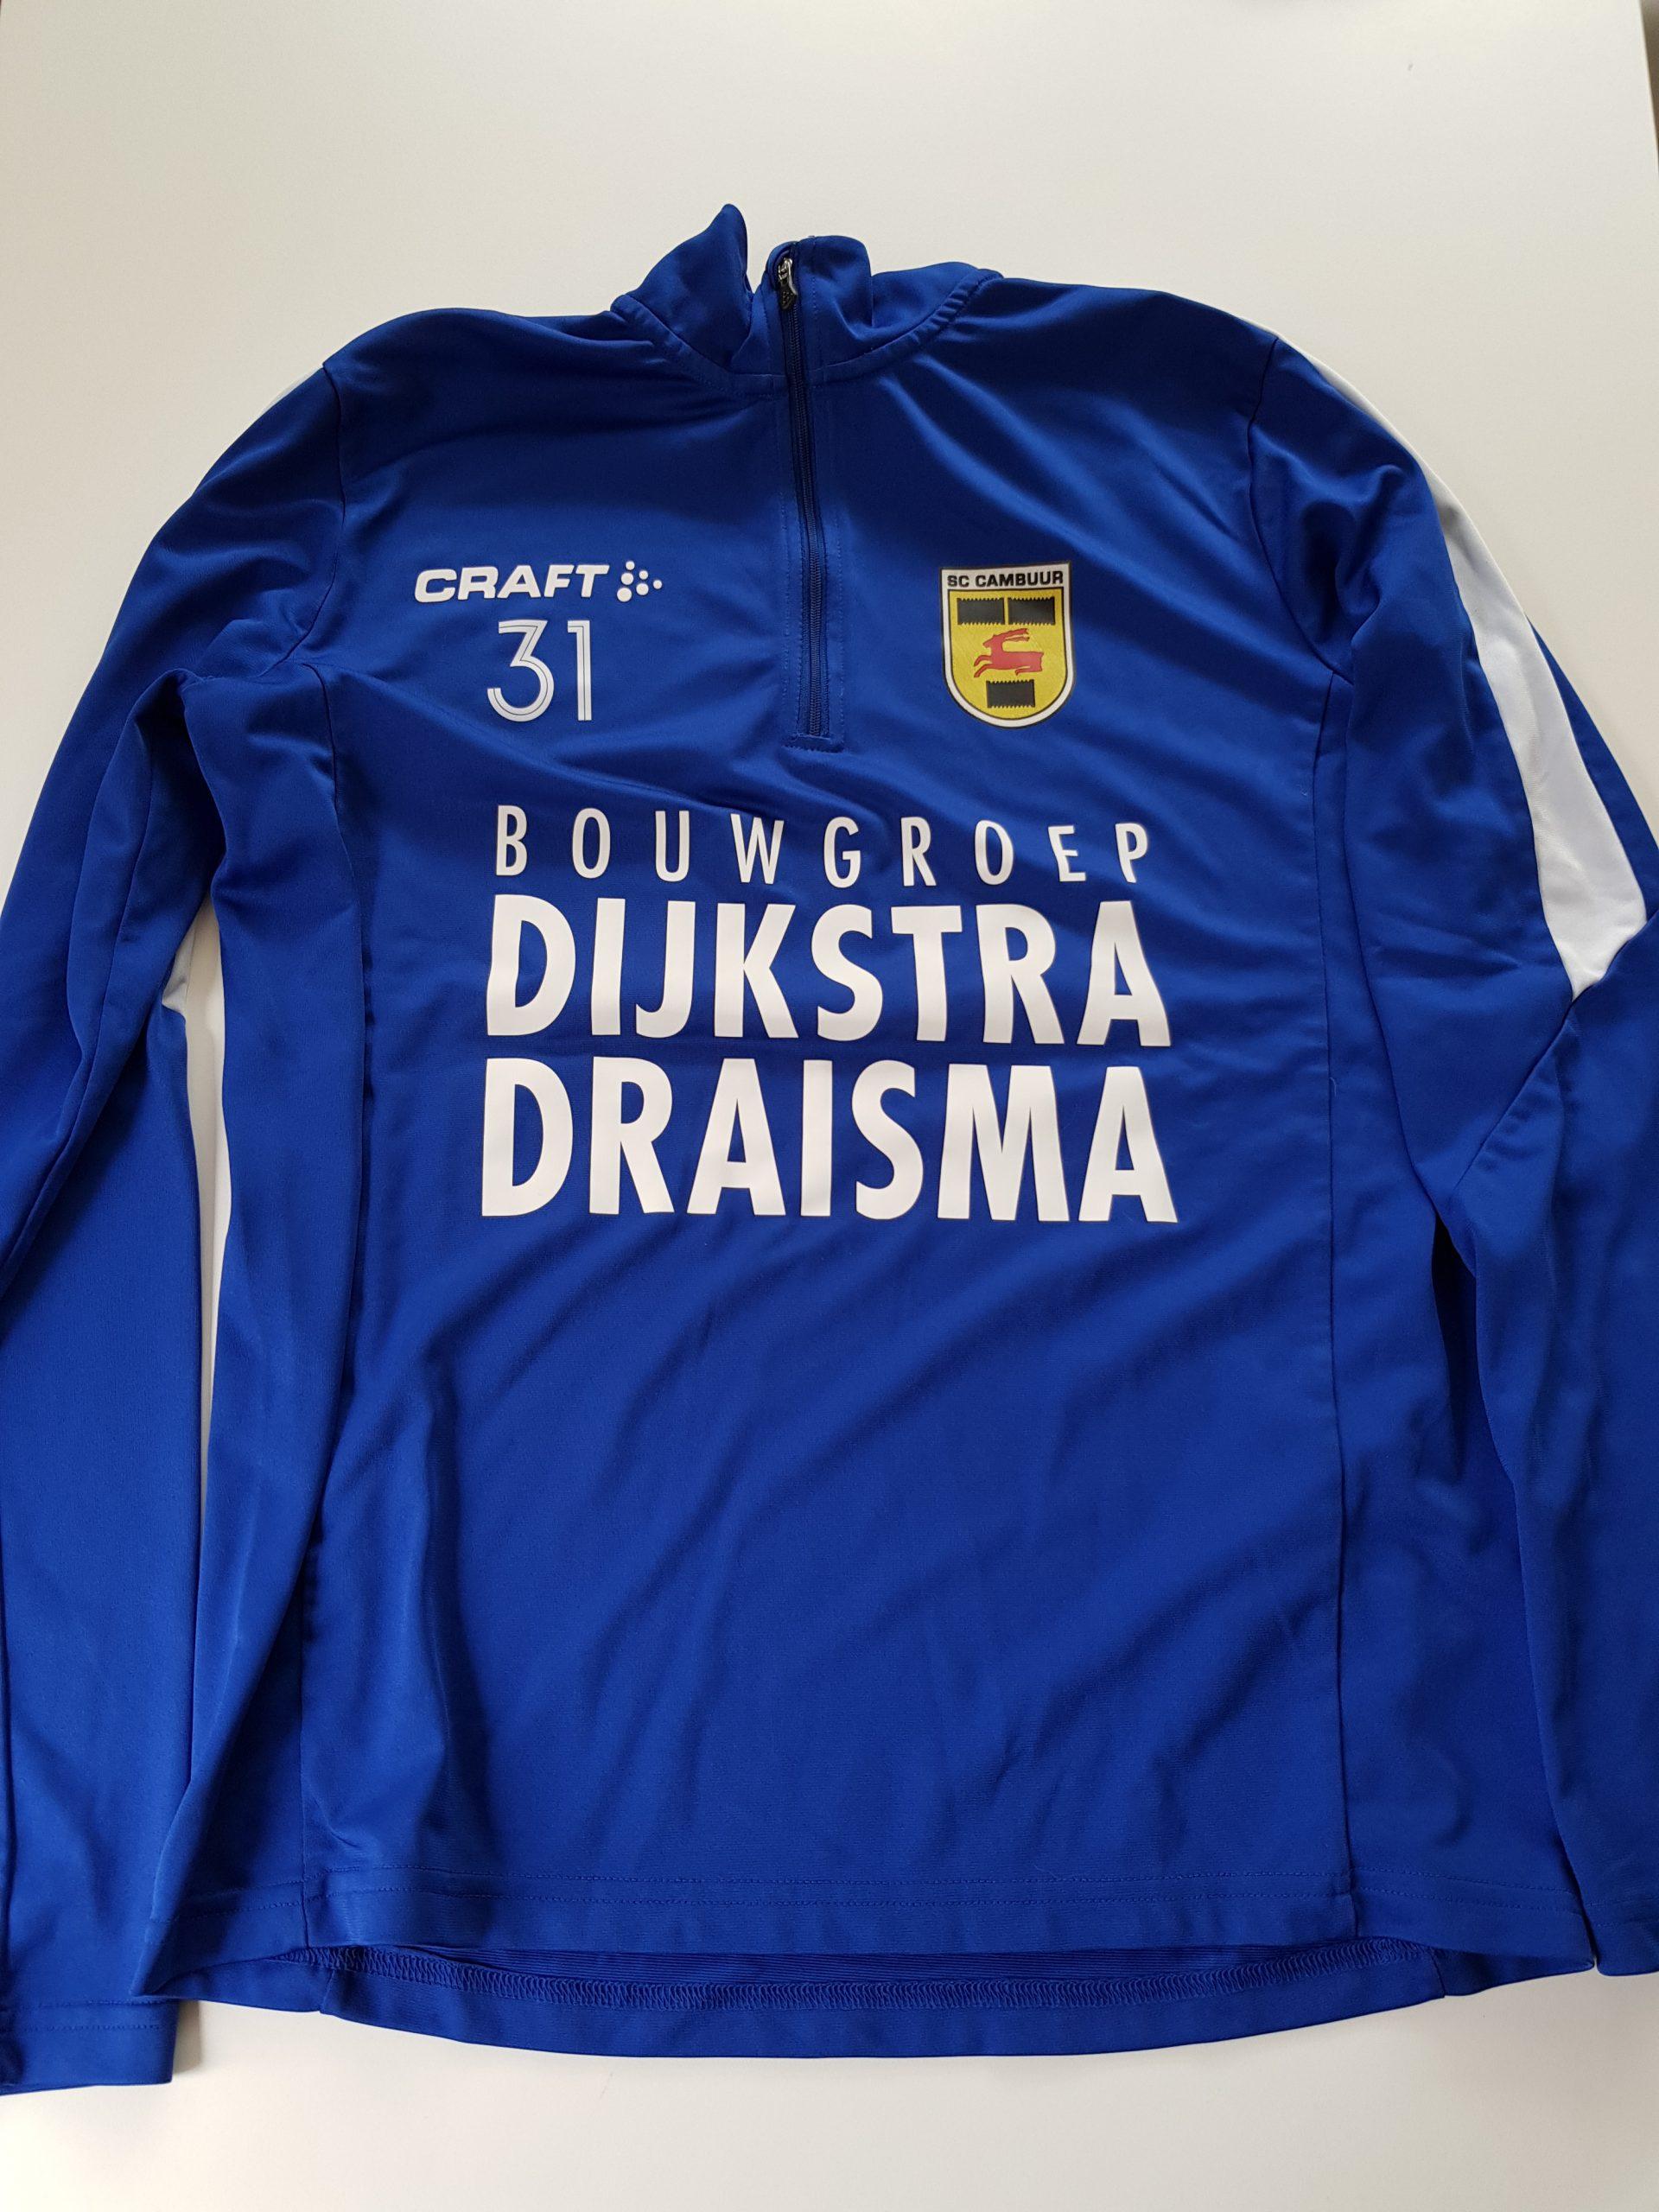 Trainingspak Piet Halman Voetbalkledingsale